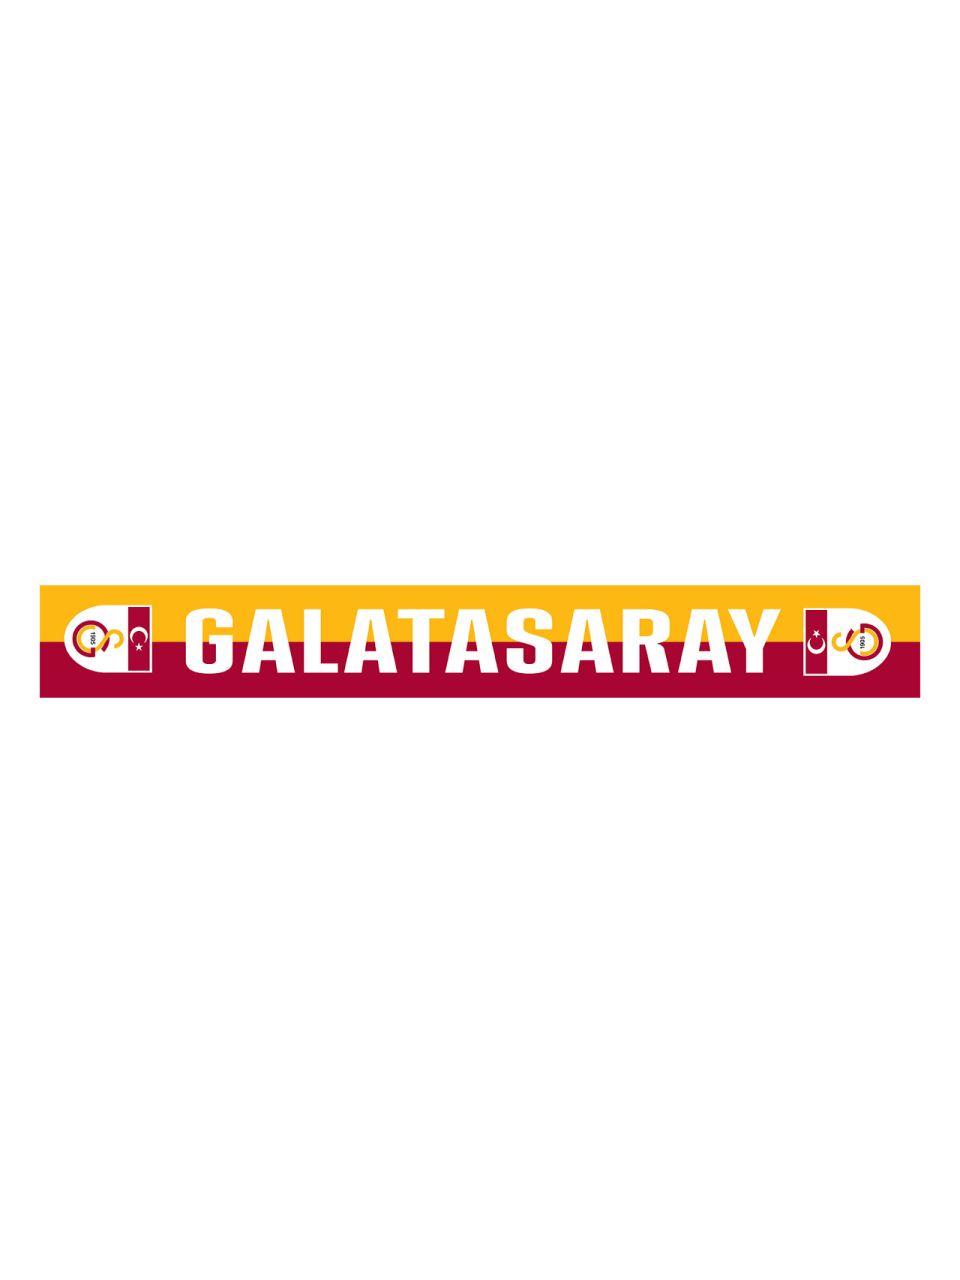 Galatasaray Kişiye Özel Atkı U212258